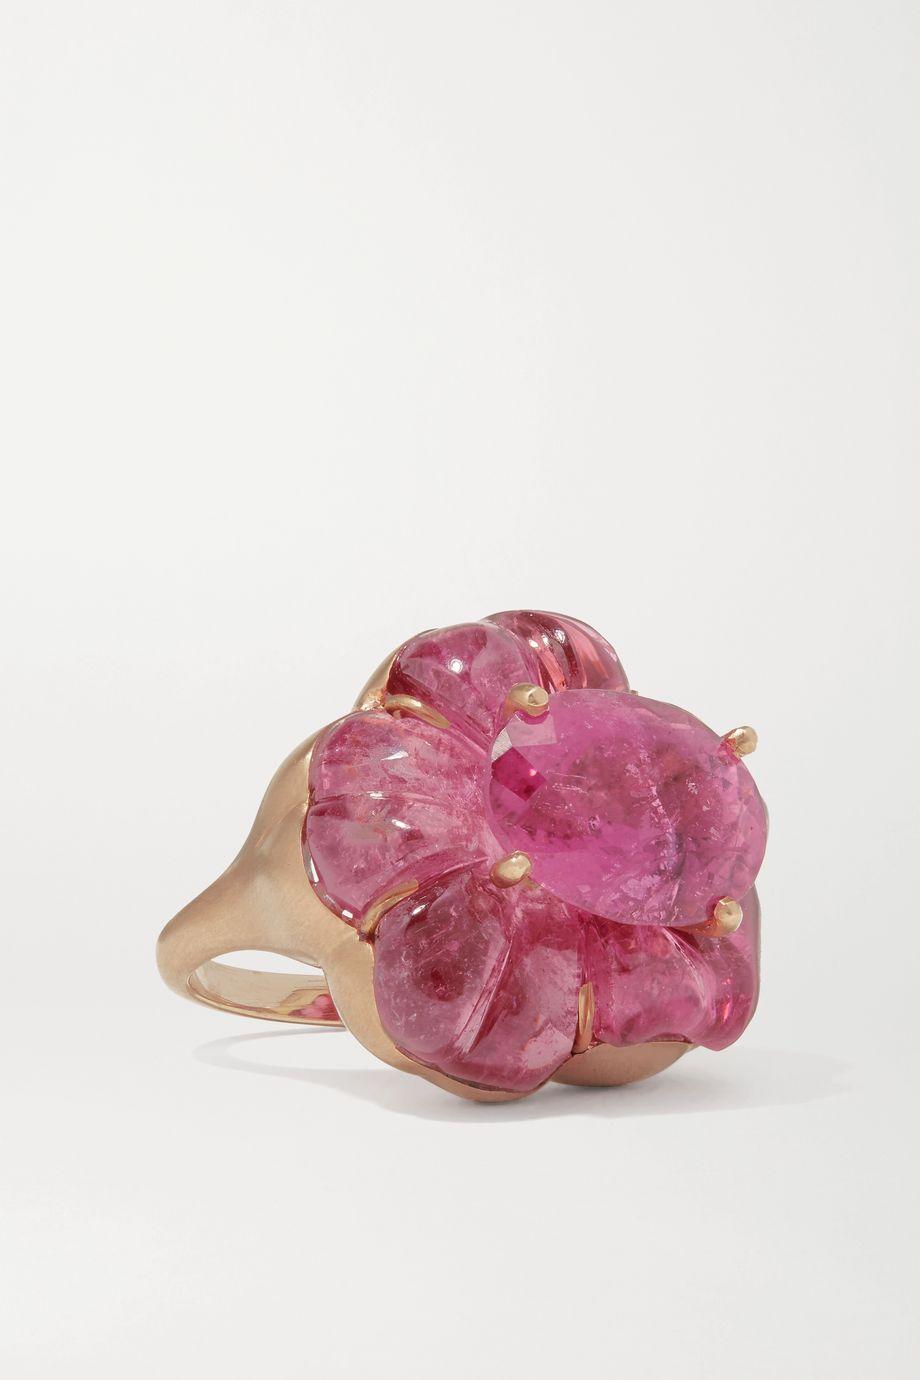 Irene Neuwirth Tropical Flower 18-karat rose gold tourmaline ring